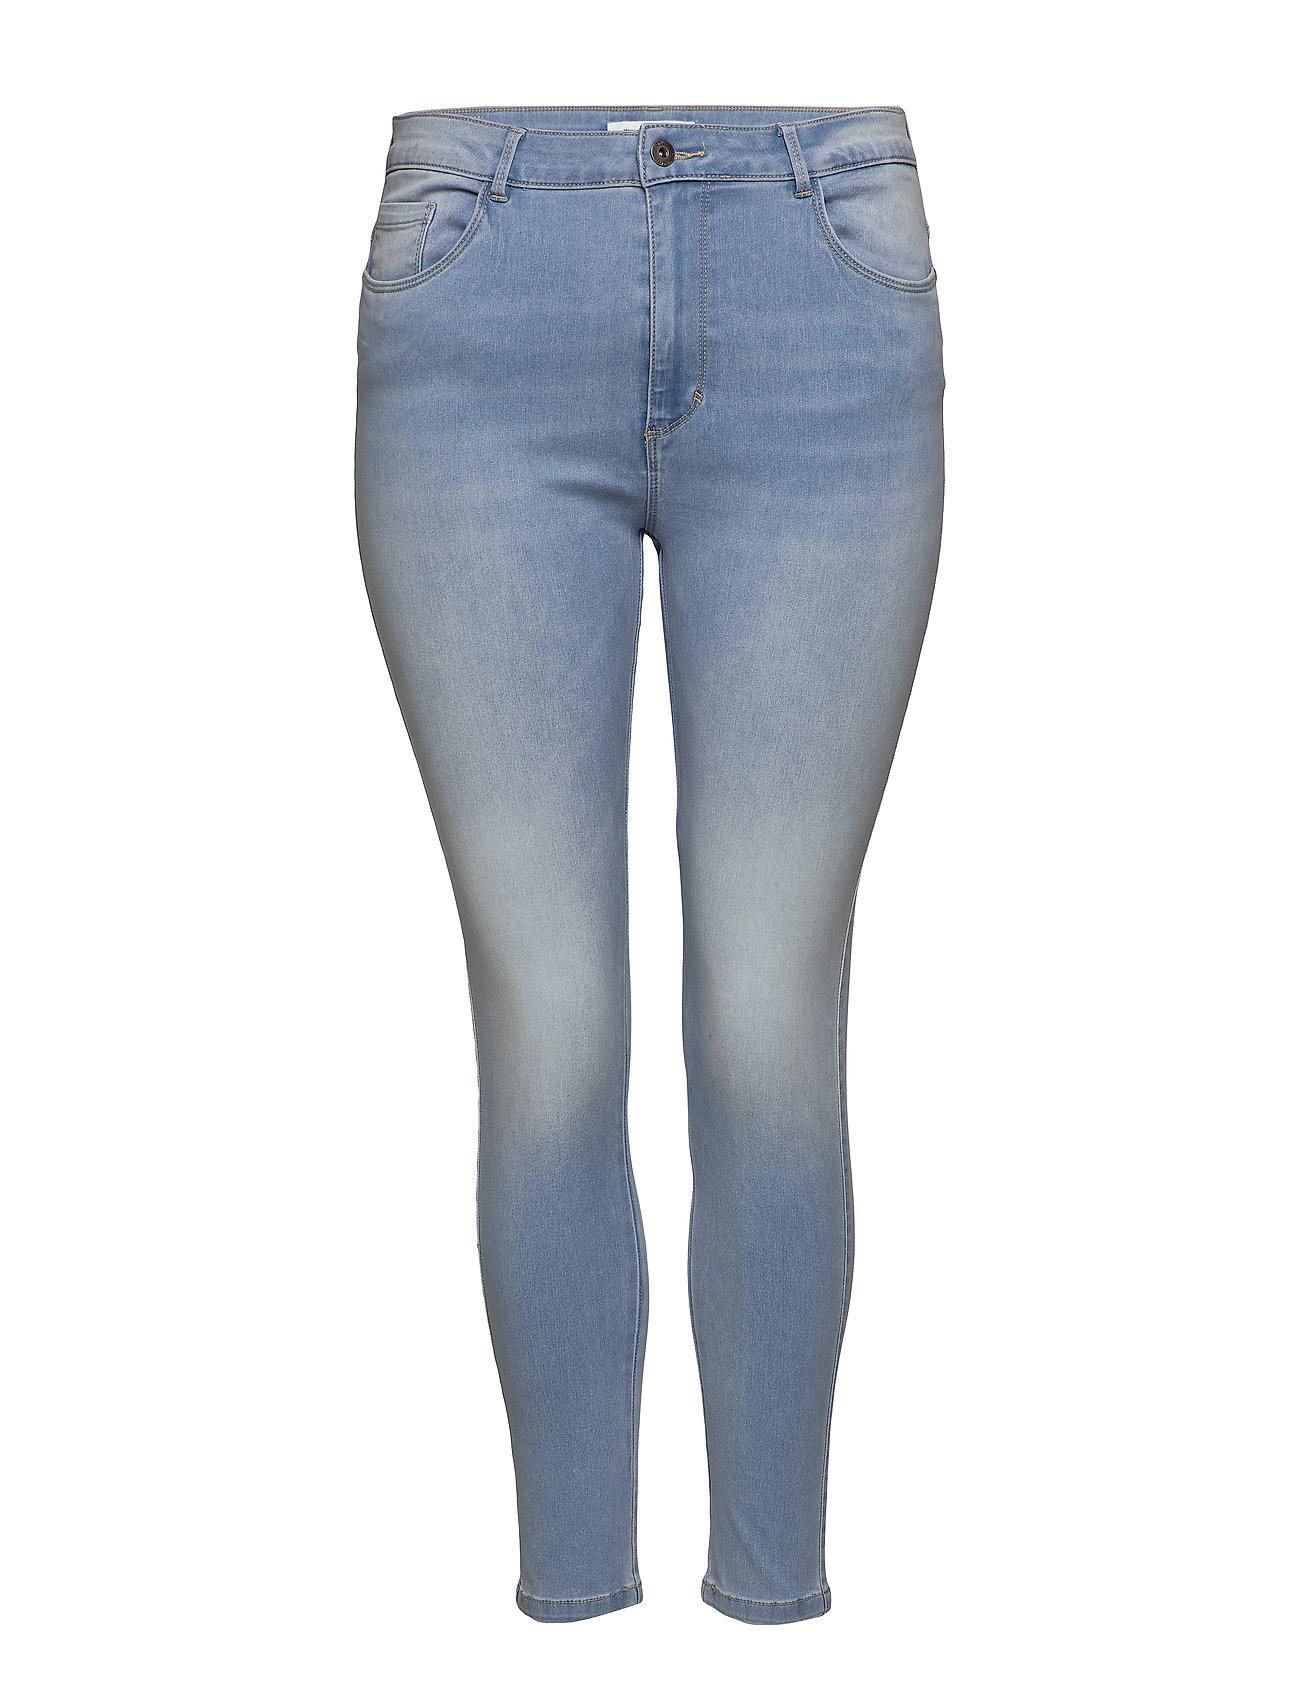 Image of Caraugusta Hw Sk Jeans Bj13333 Lbd Noos Slim Jeans Blå ONLY Carmakoma (3333160297)